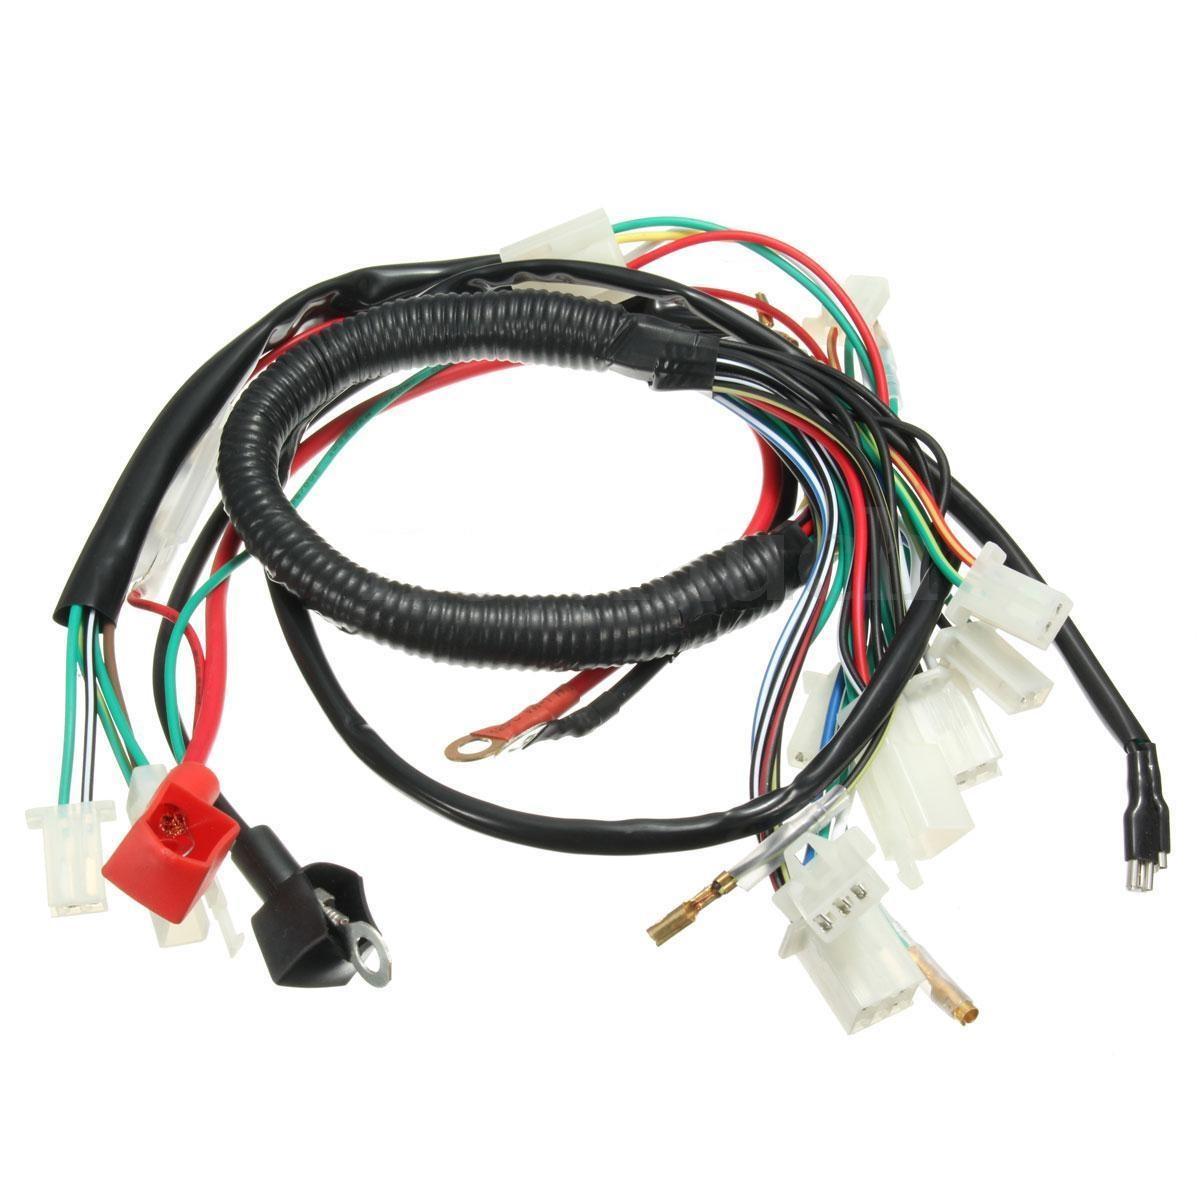 Wiring Harness 110cc ATV Automatic Engine 52FM (Hawk) on chinese wiring harness, atv wiring harness, engine wiring harness, chopper wiring harness, yamaha wiring harness, go kart wiring harness, painless wiring harness, racing wiring harness, automotive wiring harness, motorcycle wiring harness, reverse wiring harness, 250cc wiring harness, bike wiring harness, suzuki wiring harness, cdi wiring harness, 150cc wiring harness, xs48 107cm wiring harness, pioneer wiring harness, 70cc wiring harness, honda wiring harness,